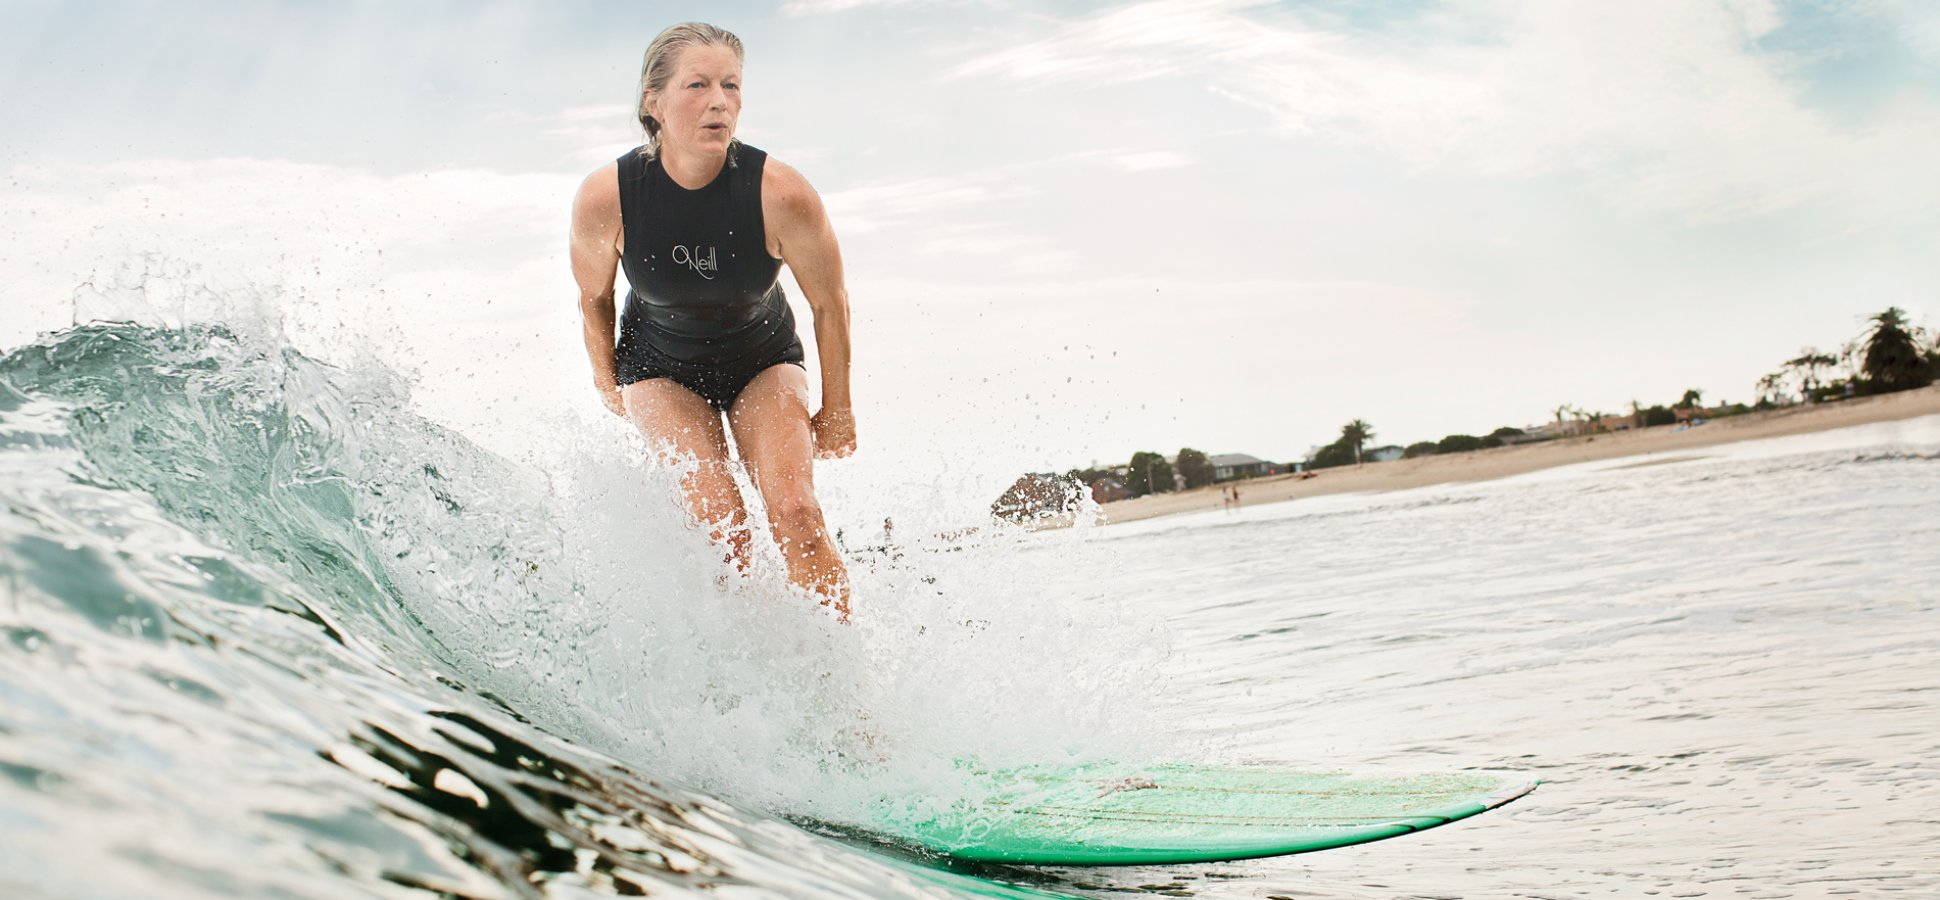 surfer_pano_71134.jpg